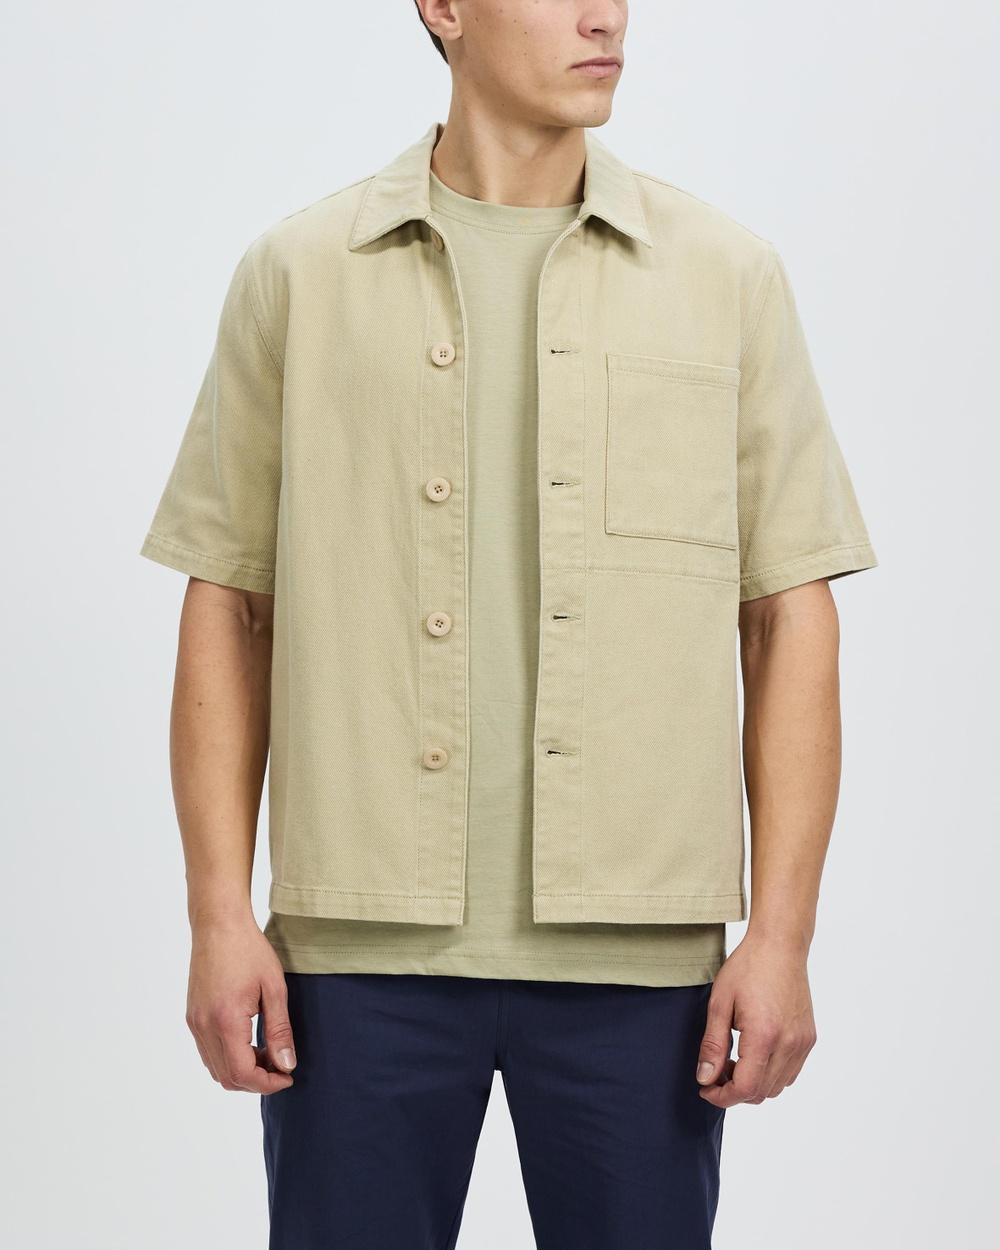 AERE Organic Twill SS Overshirt Casual shirts Sand